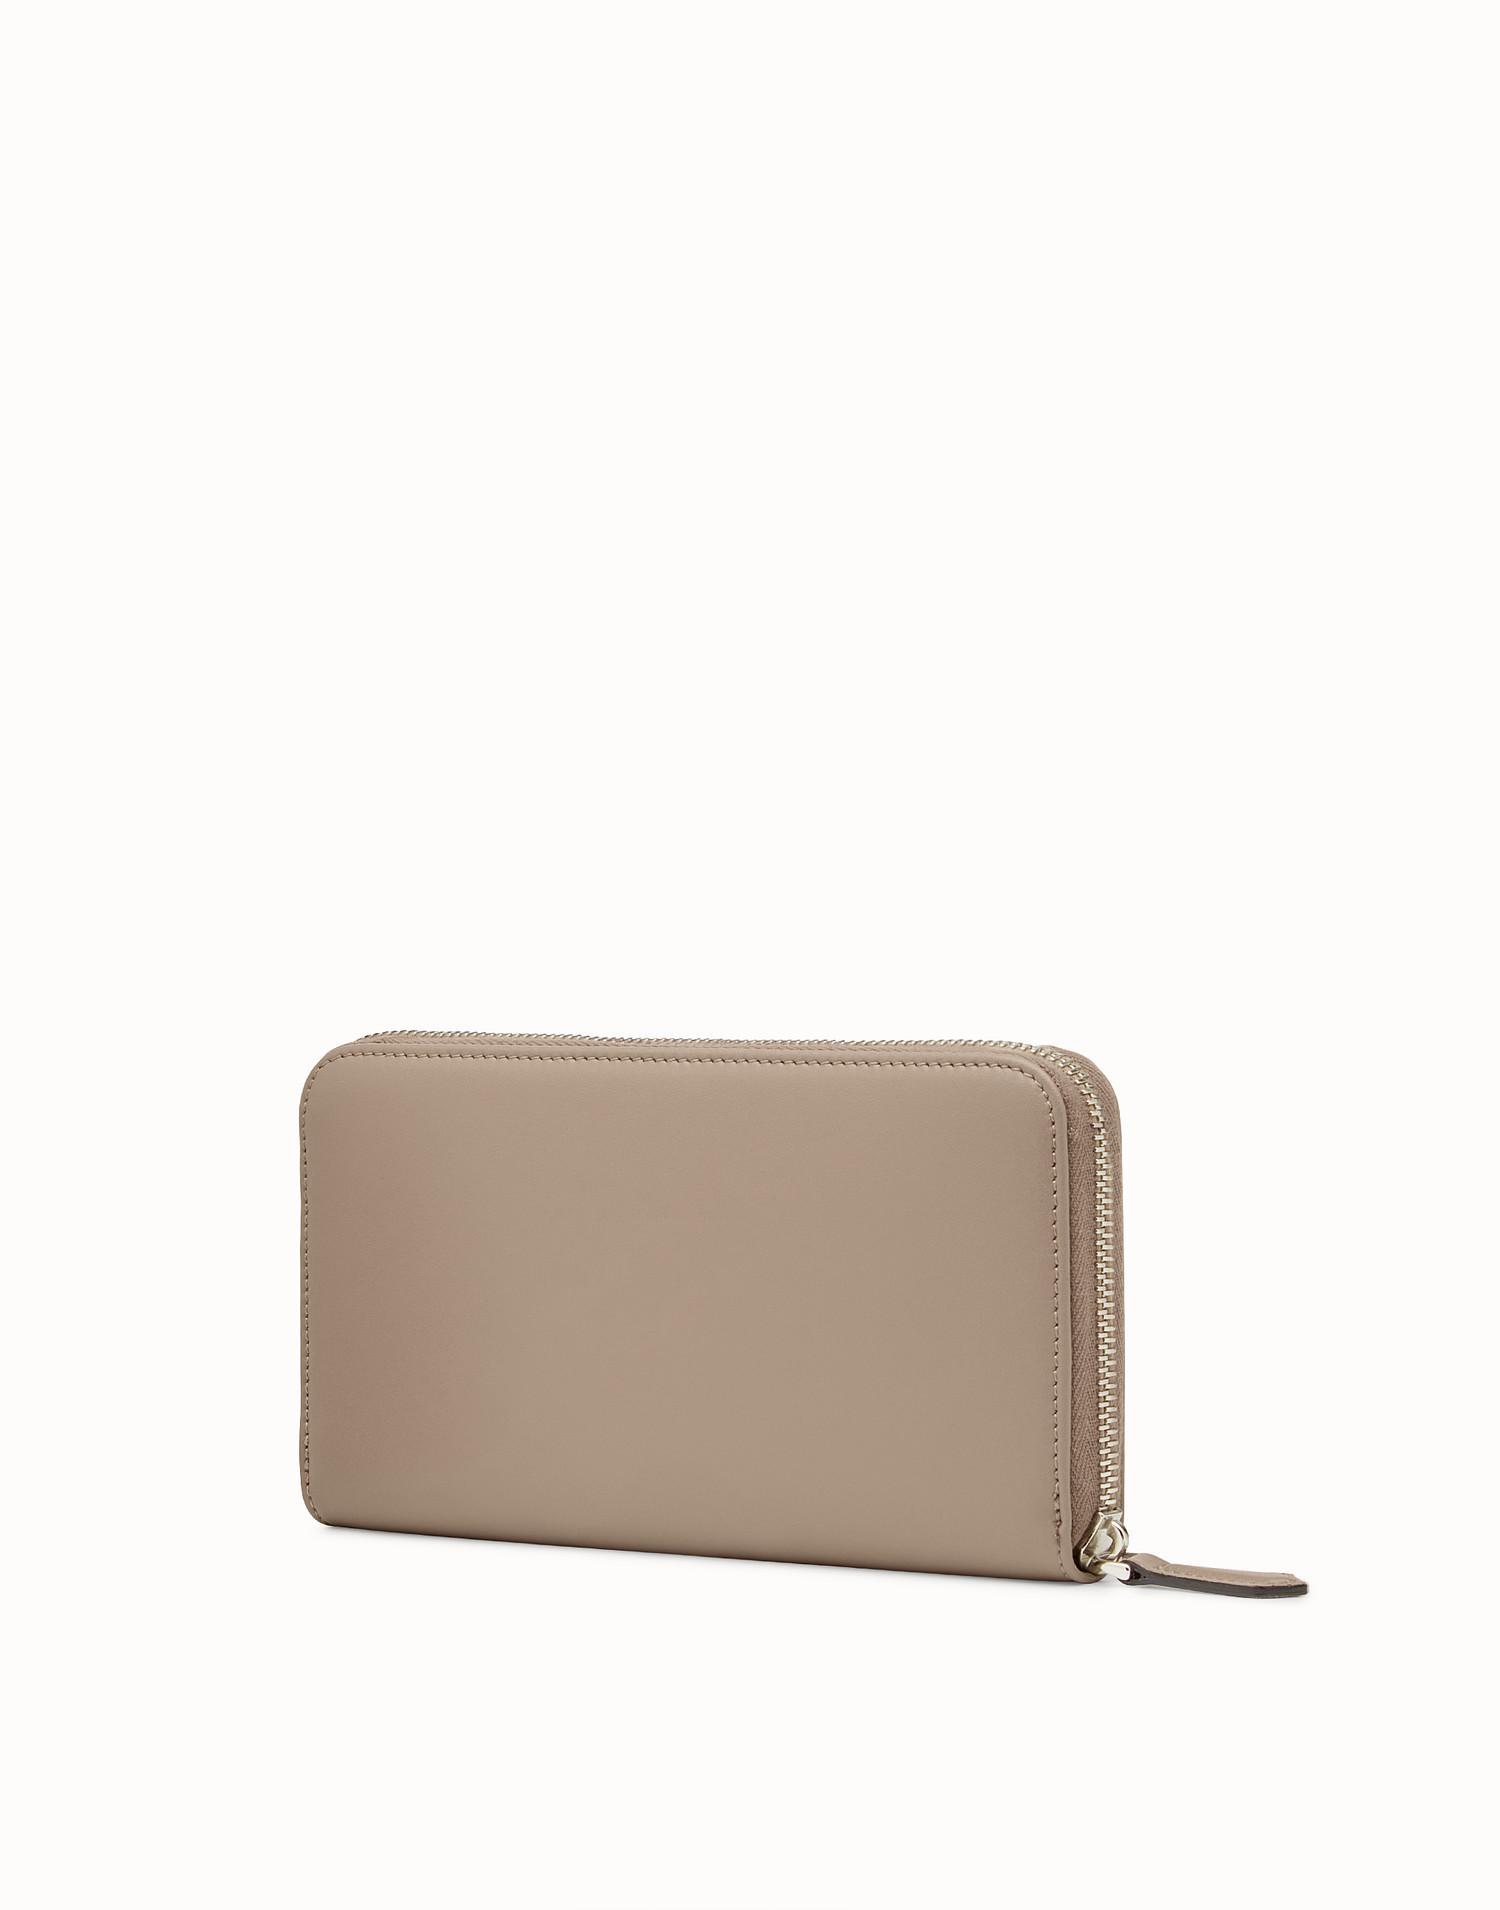 d83152f57de ... new zealand lyst fendi wallet wallet in gray b521d 4f6bc amazon  authentic fendi signature ff braided strap bag ...